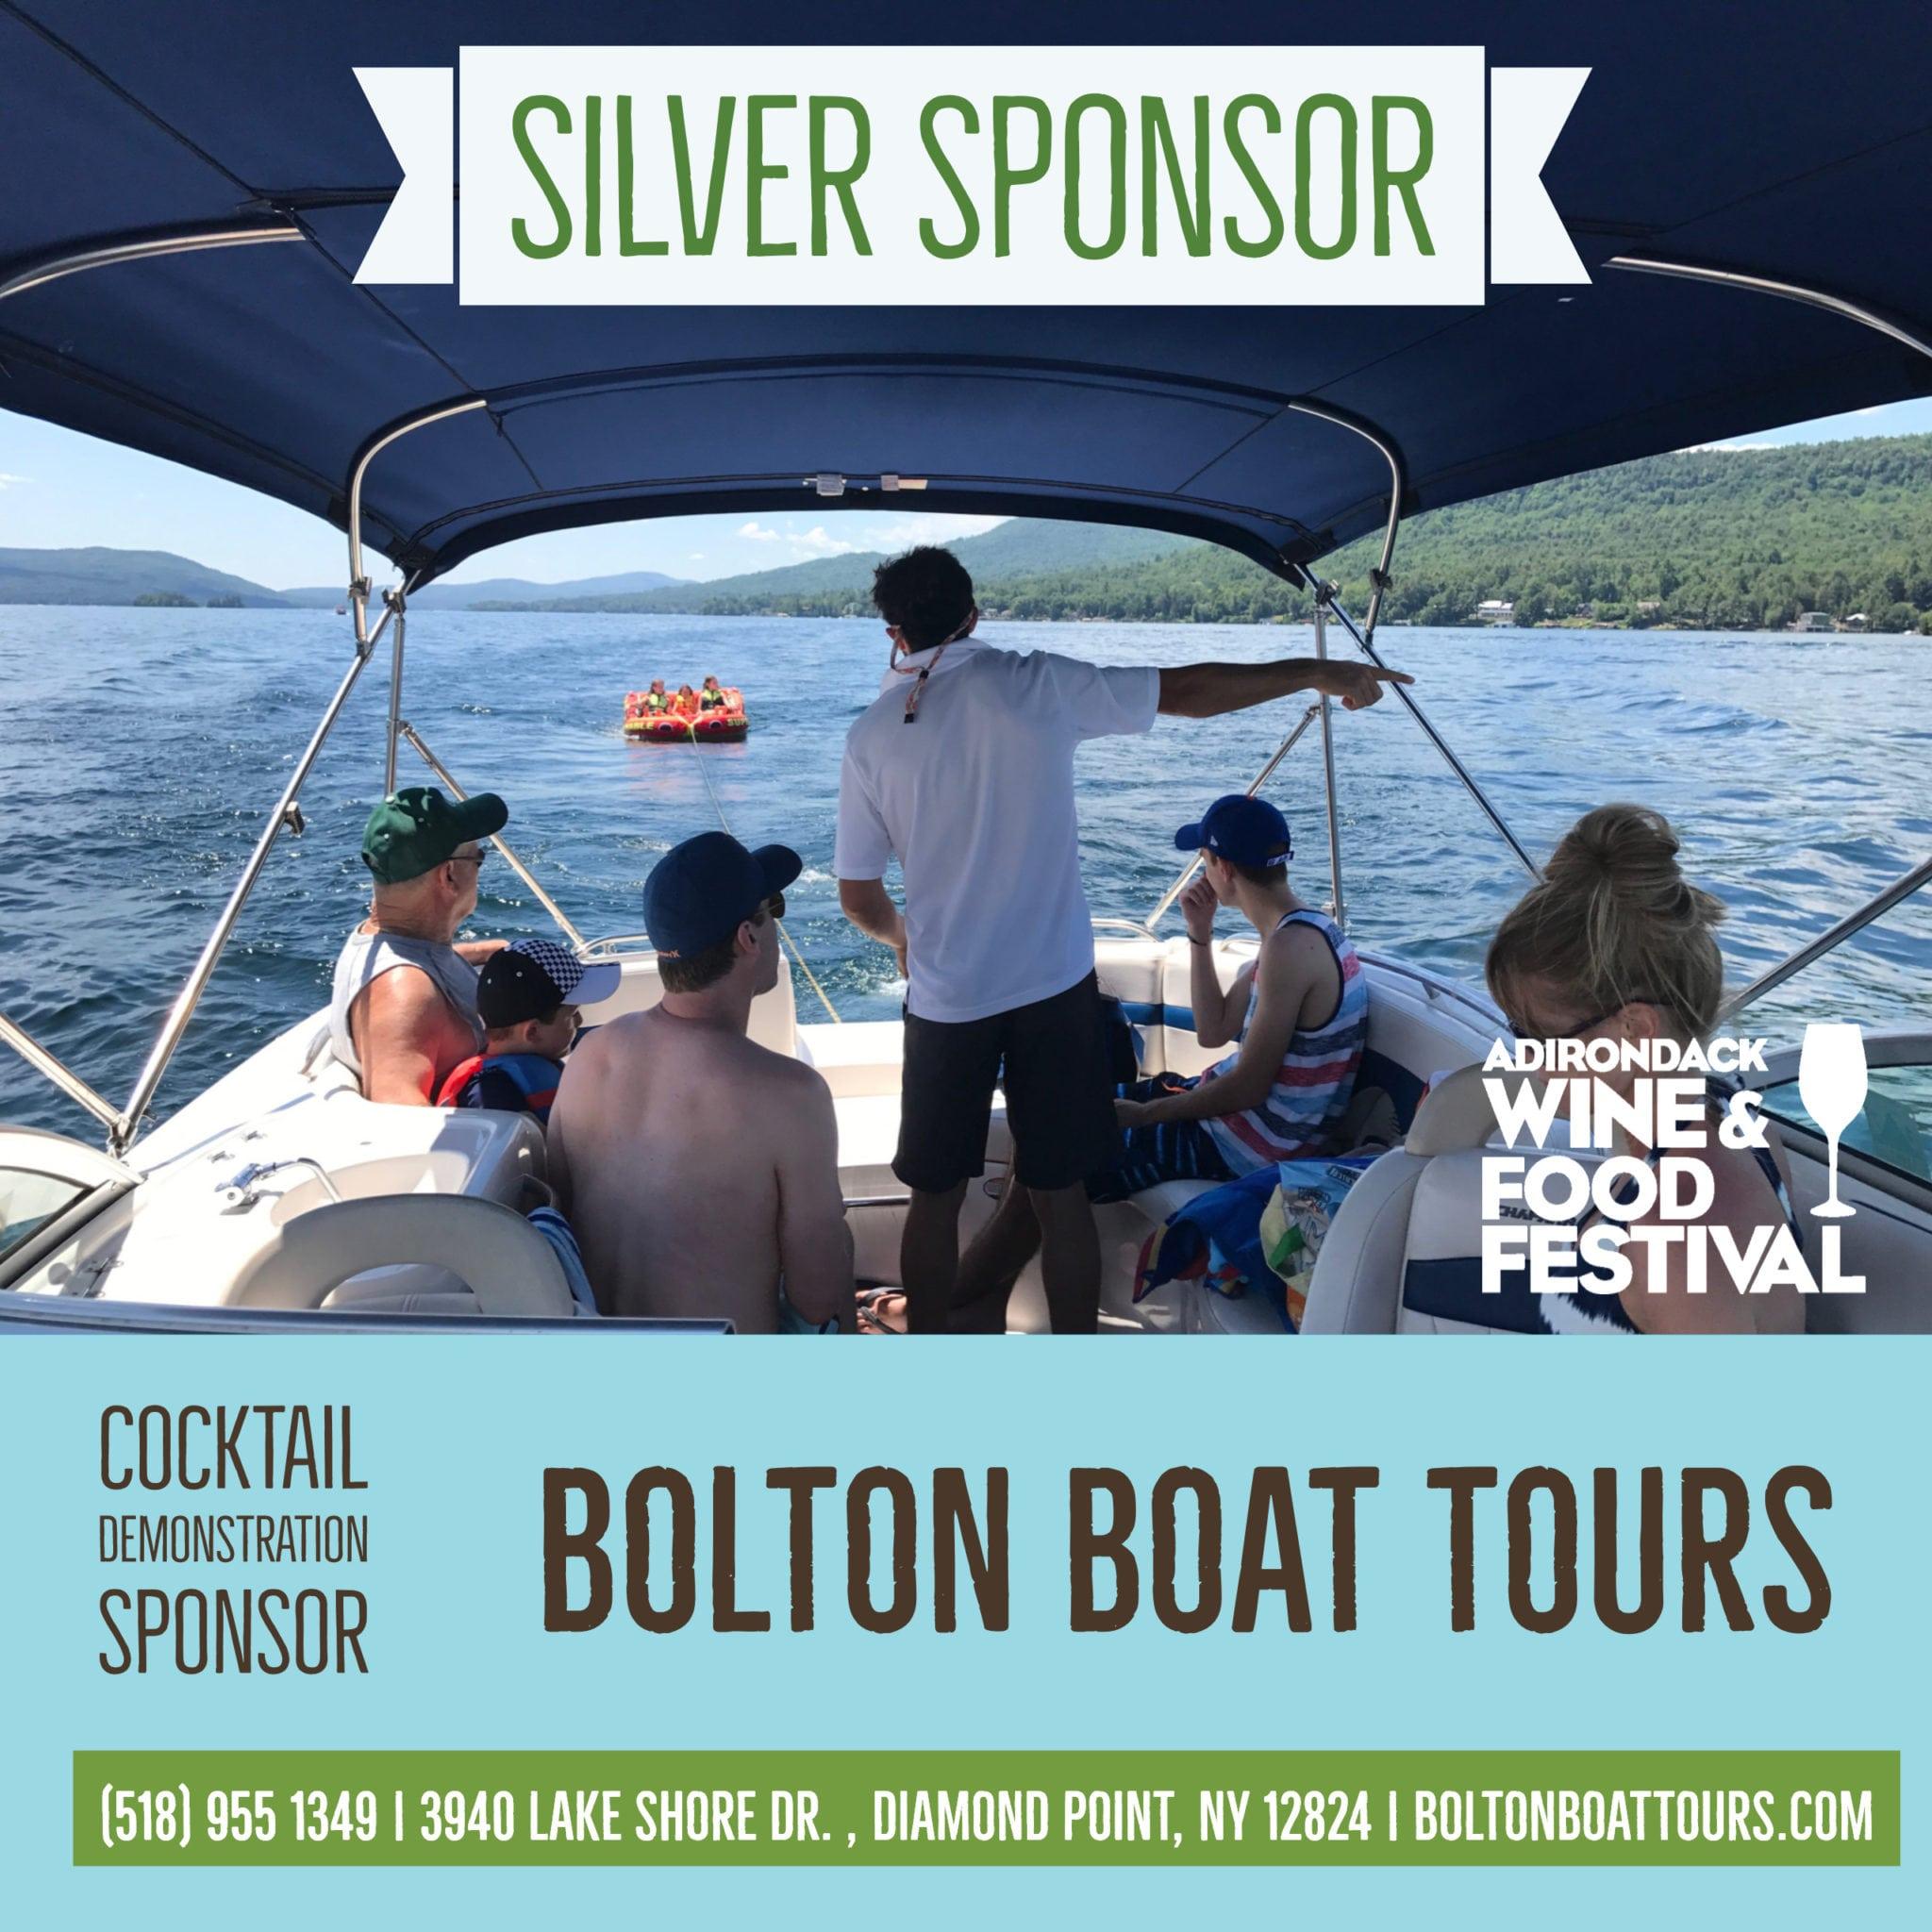 Bolton Boat Tours